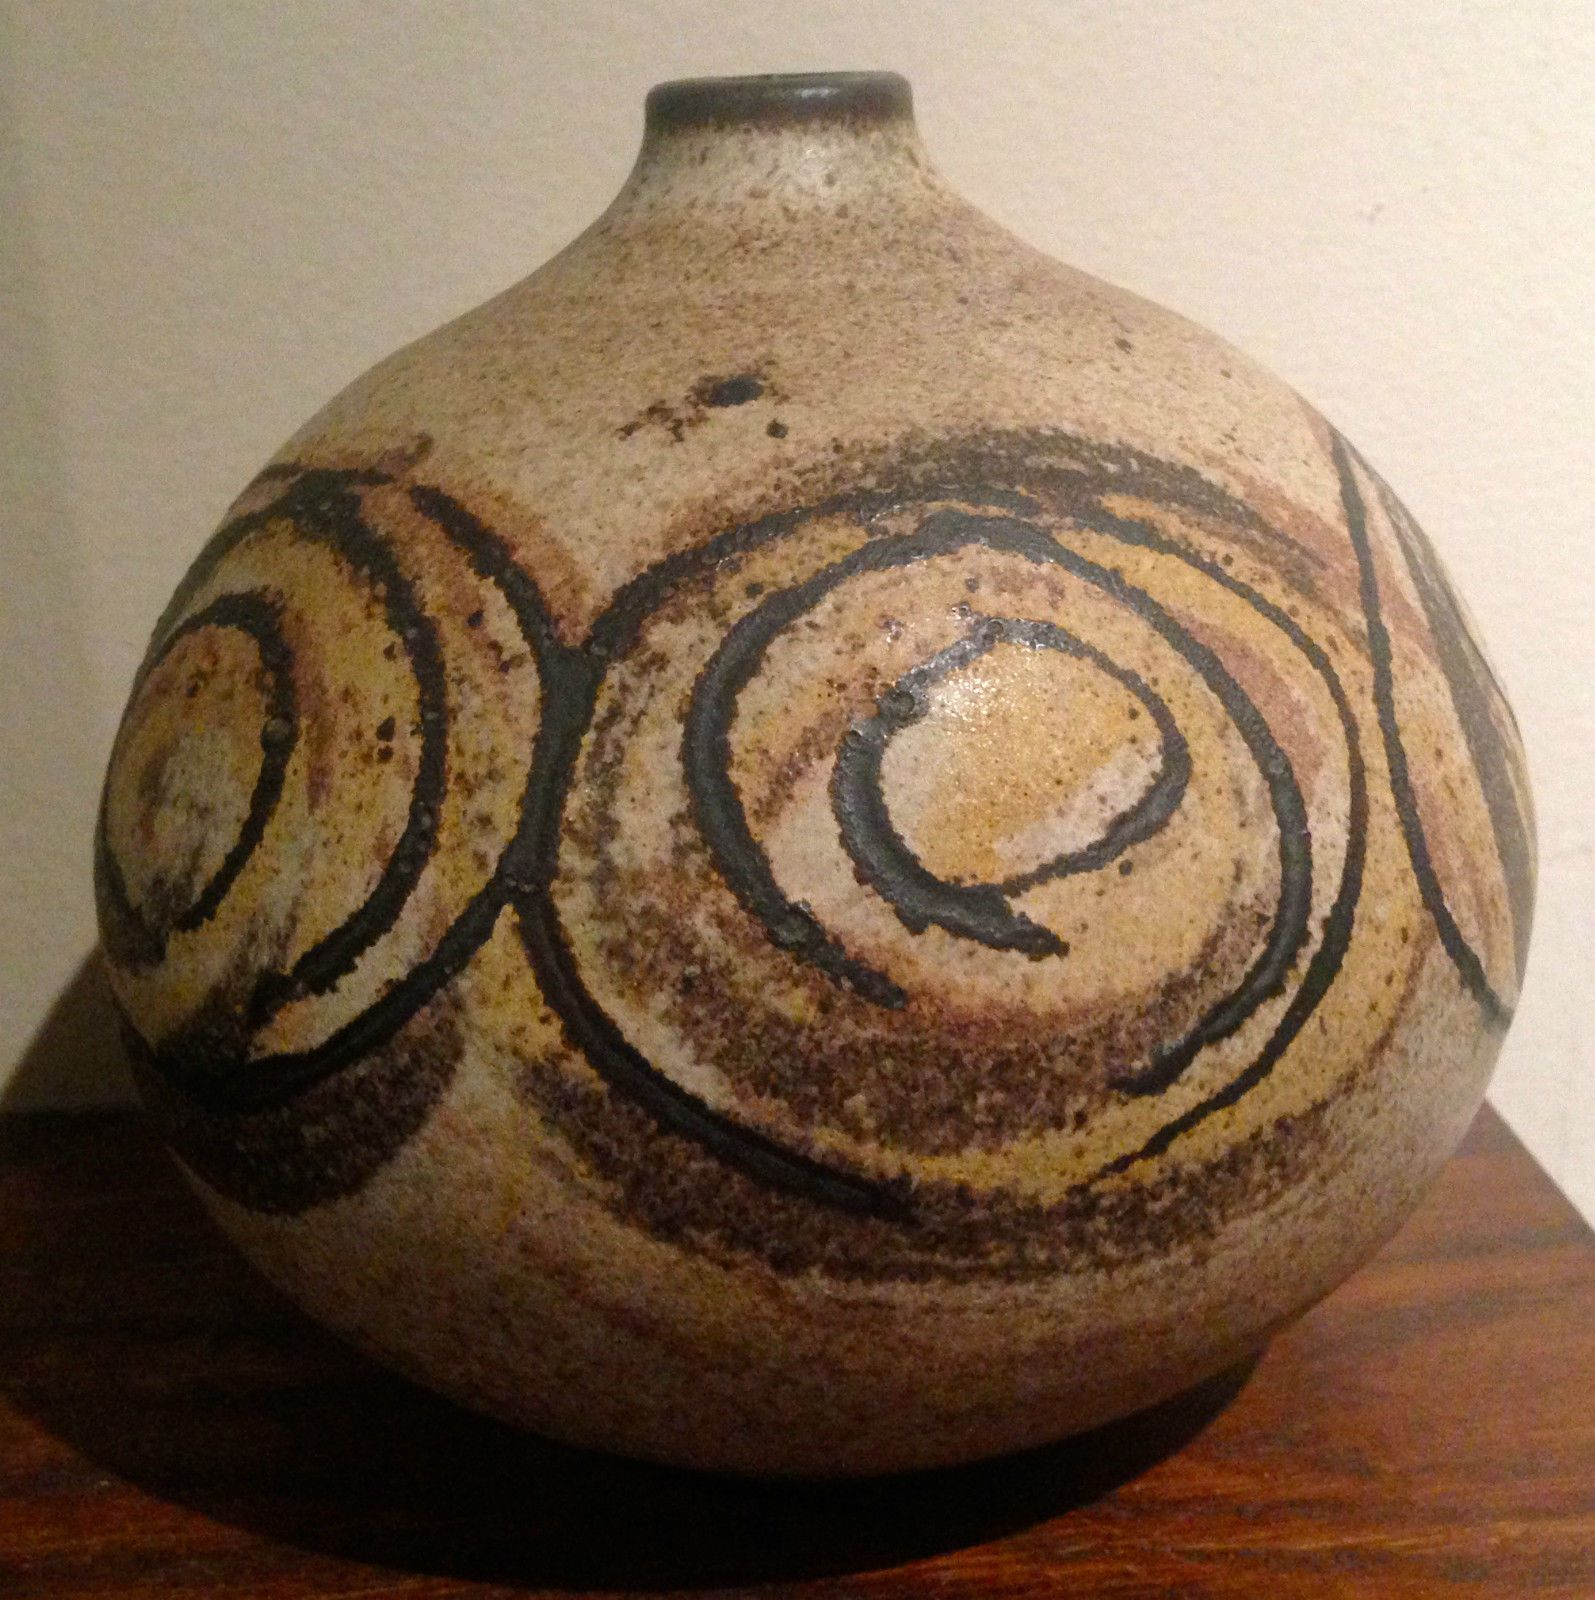 Mid century clyde burt studio pottery vase pottery vase pottery mid century clyde burt studio pottery vase reviewsmspy